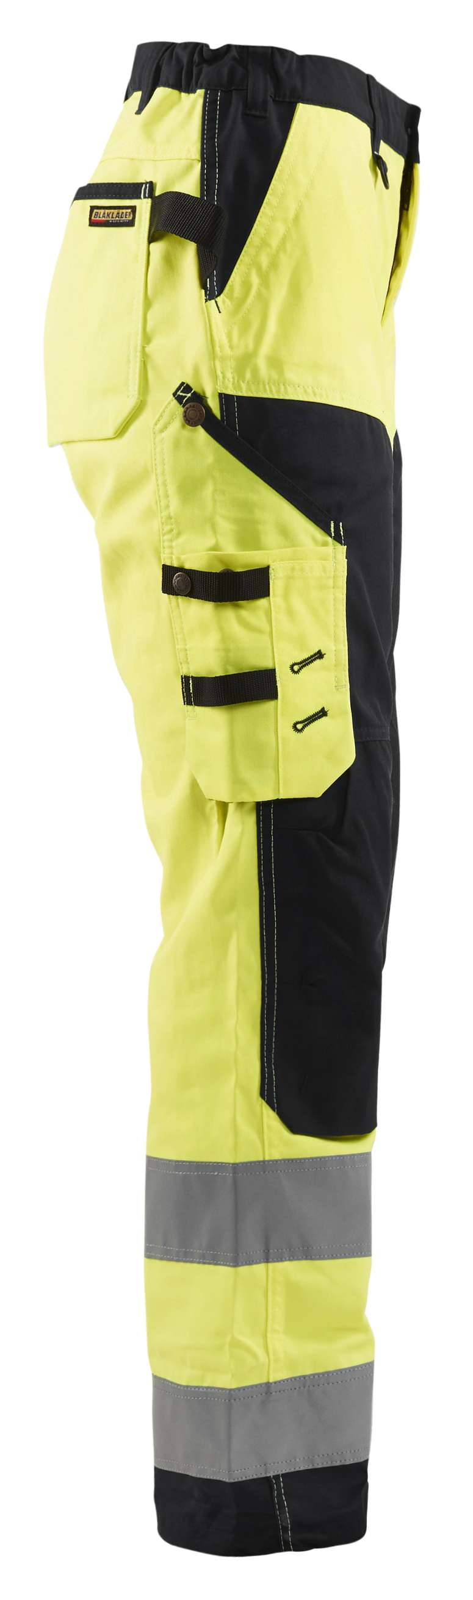 Blaklader Dames werkbroeken 71551811 High Vis geel-zwart(3399)